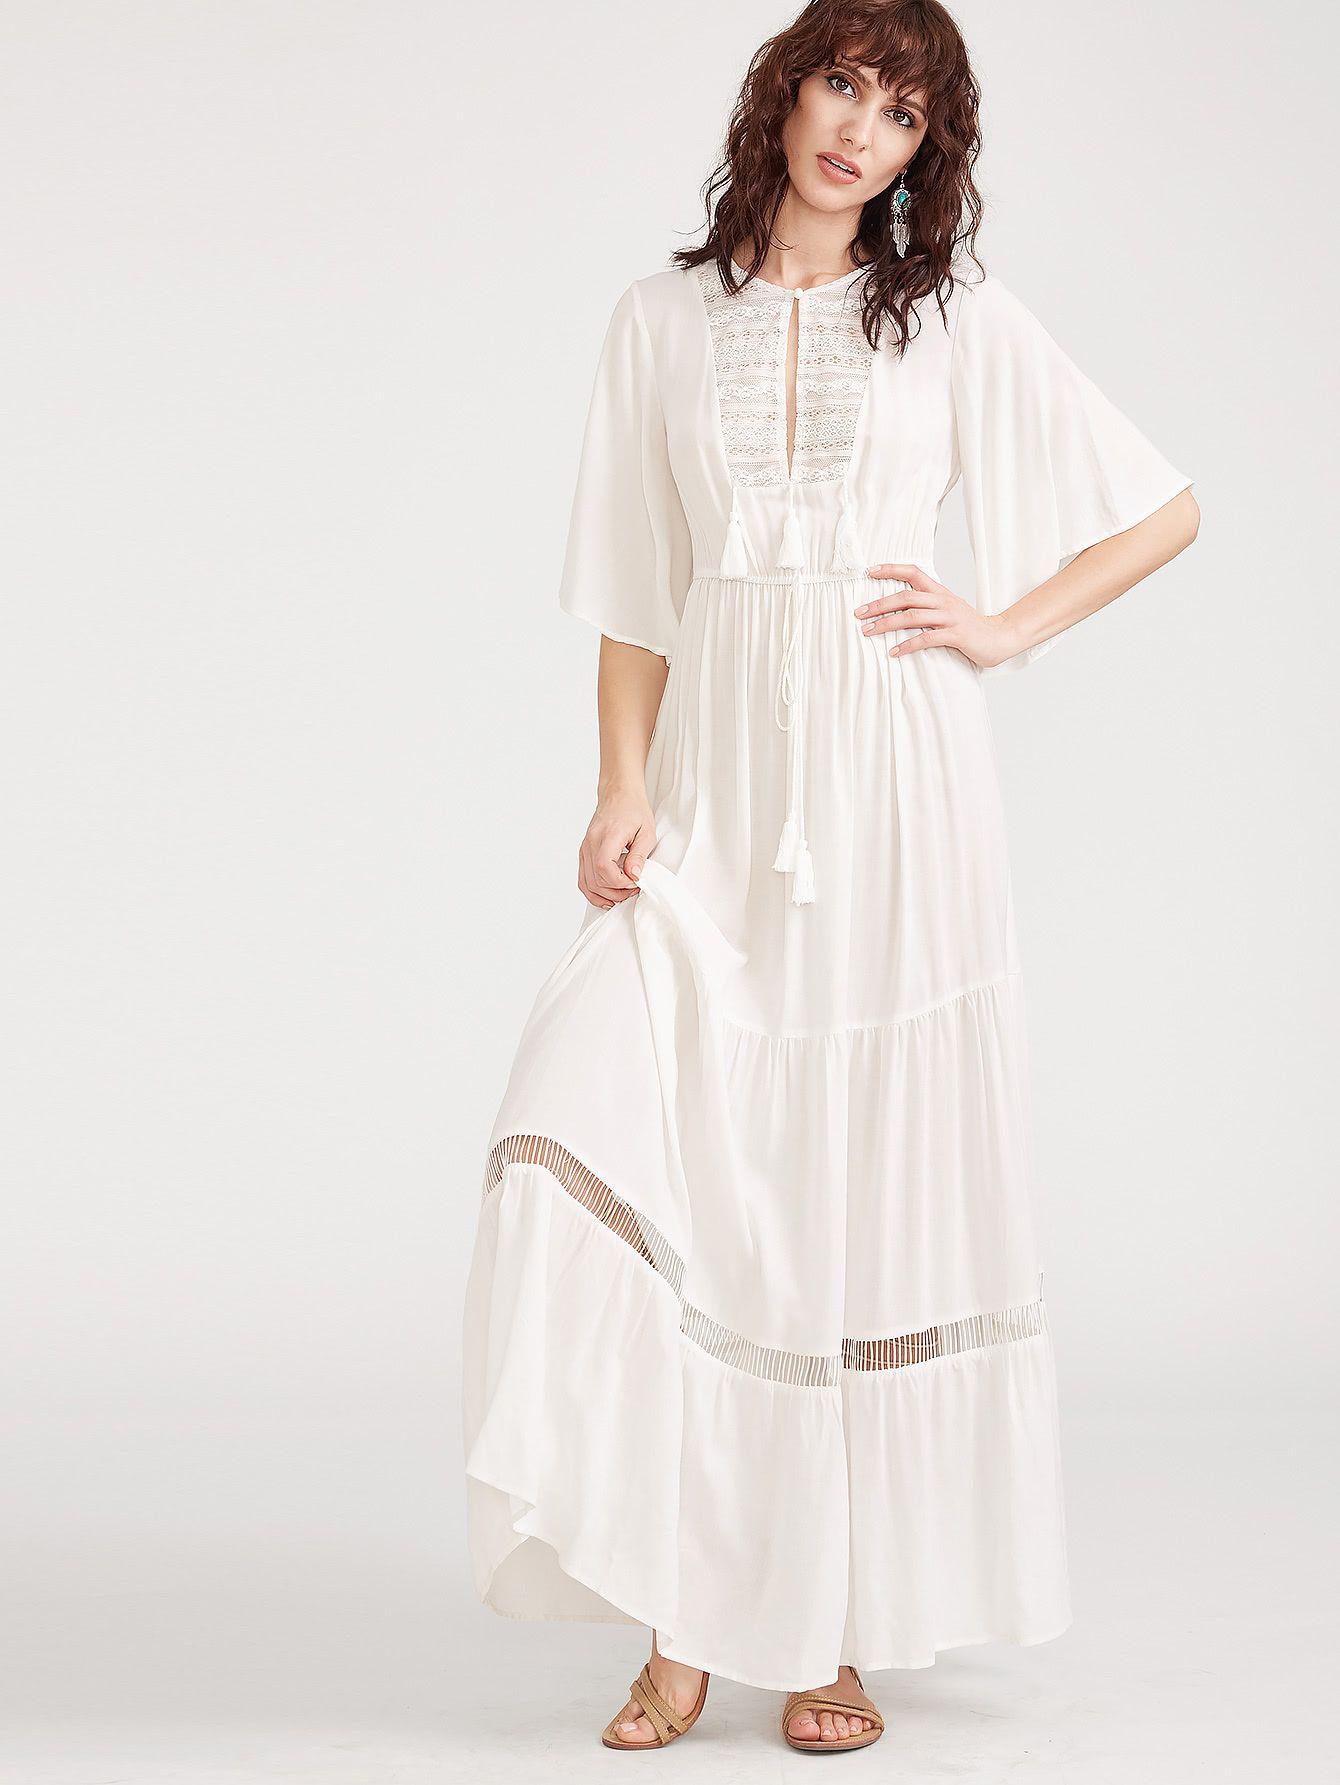 White Lace Yoke Flutter Sleeve Tasseled Tie Peasant Dress Trendy Dresses Lace White Dress White Dress Summer [ 1785 x 1340 Pixel ]